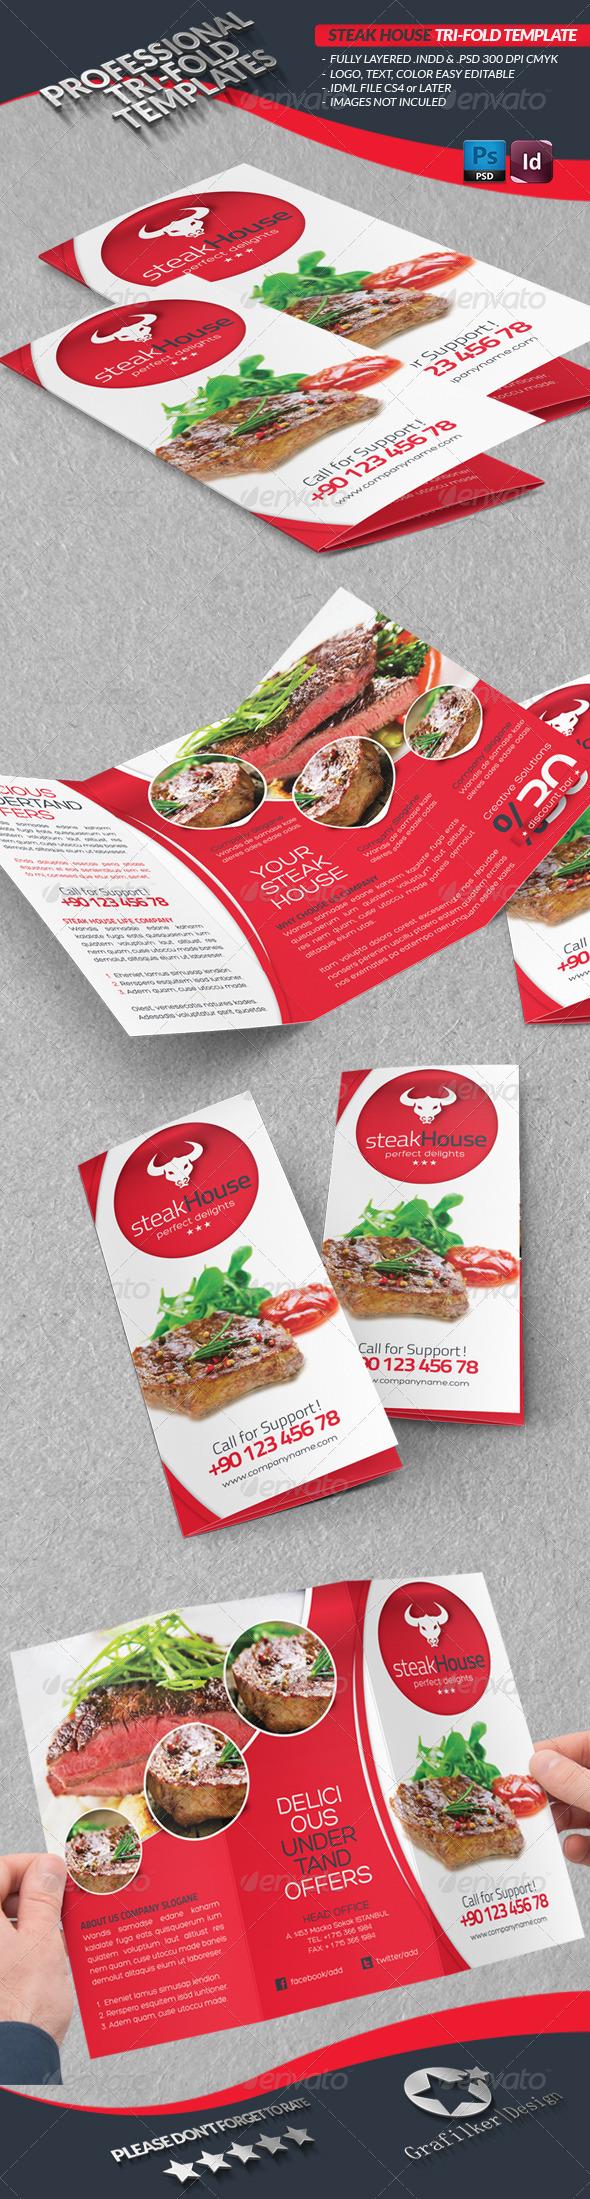 GraphicRiver Steak House Tri-fold Template 4362418